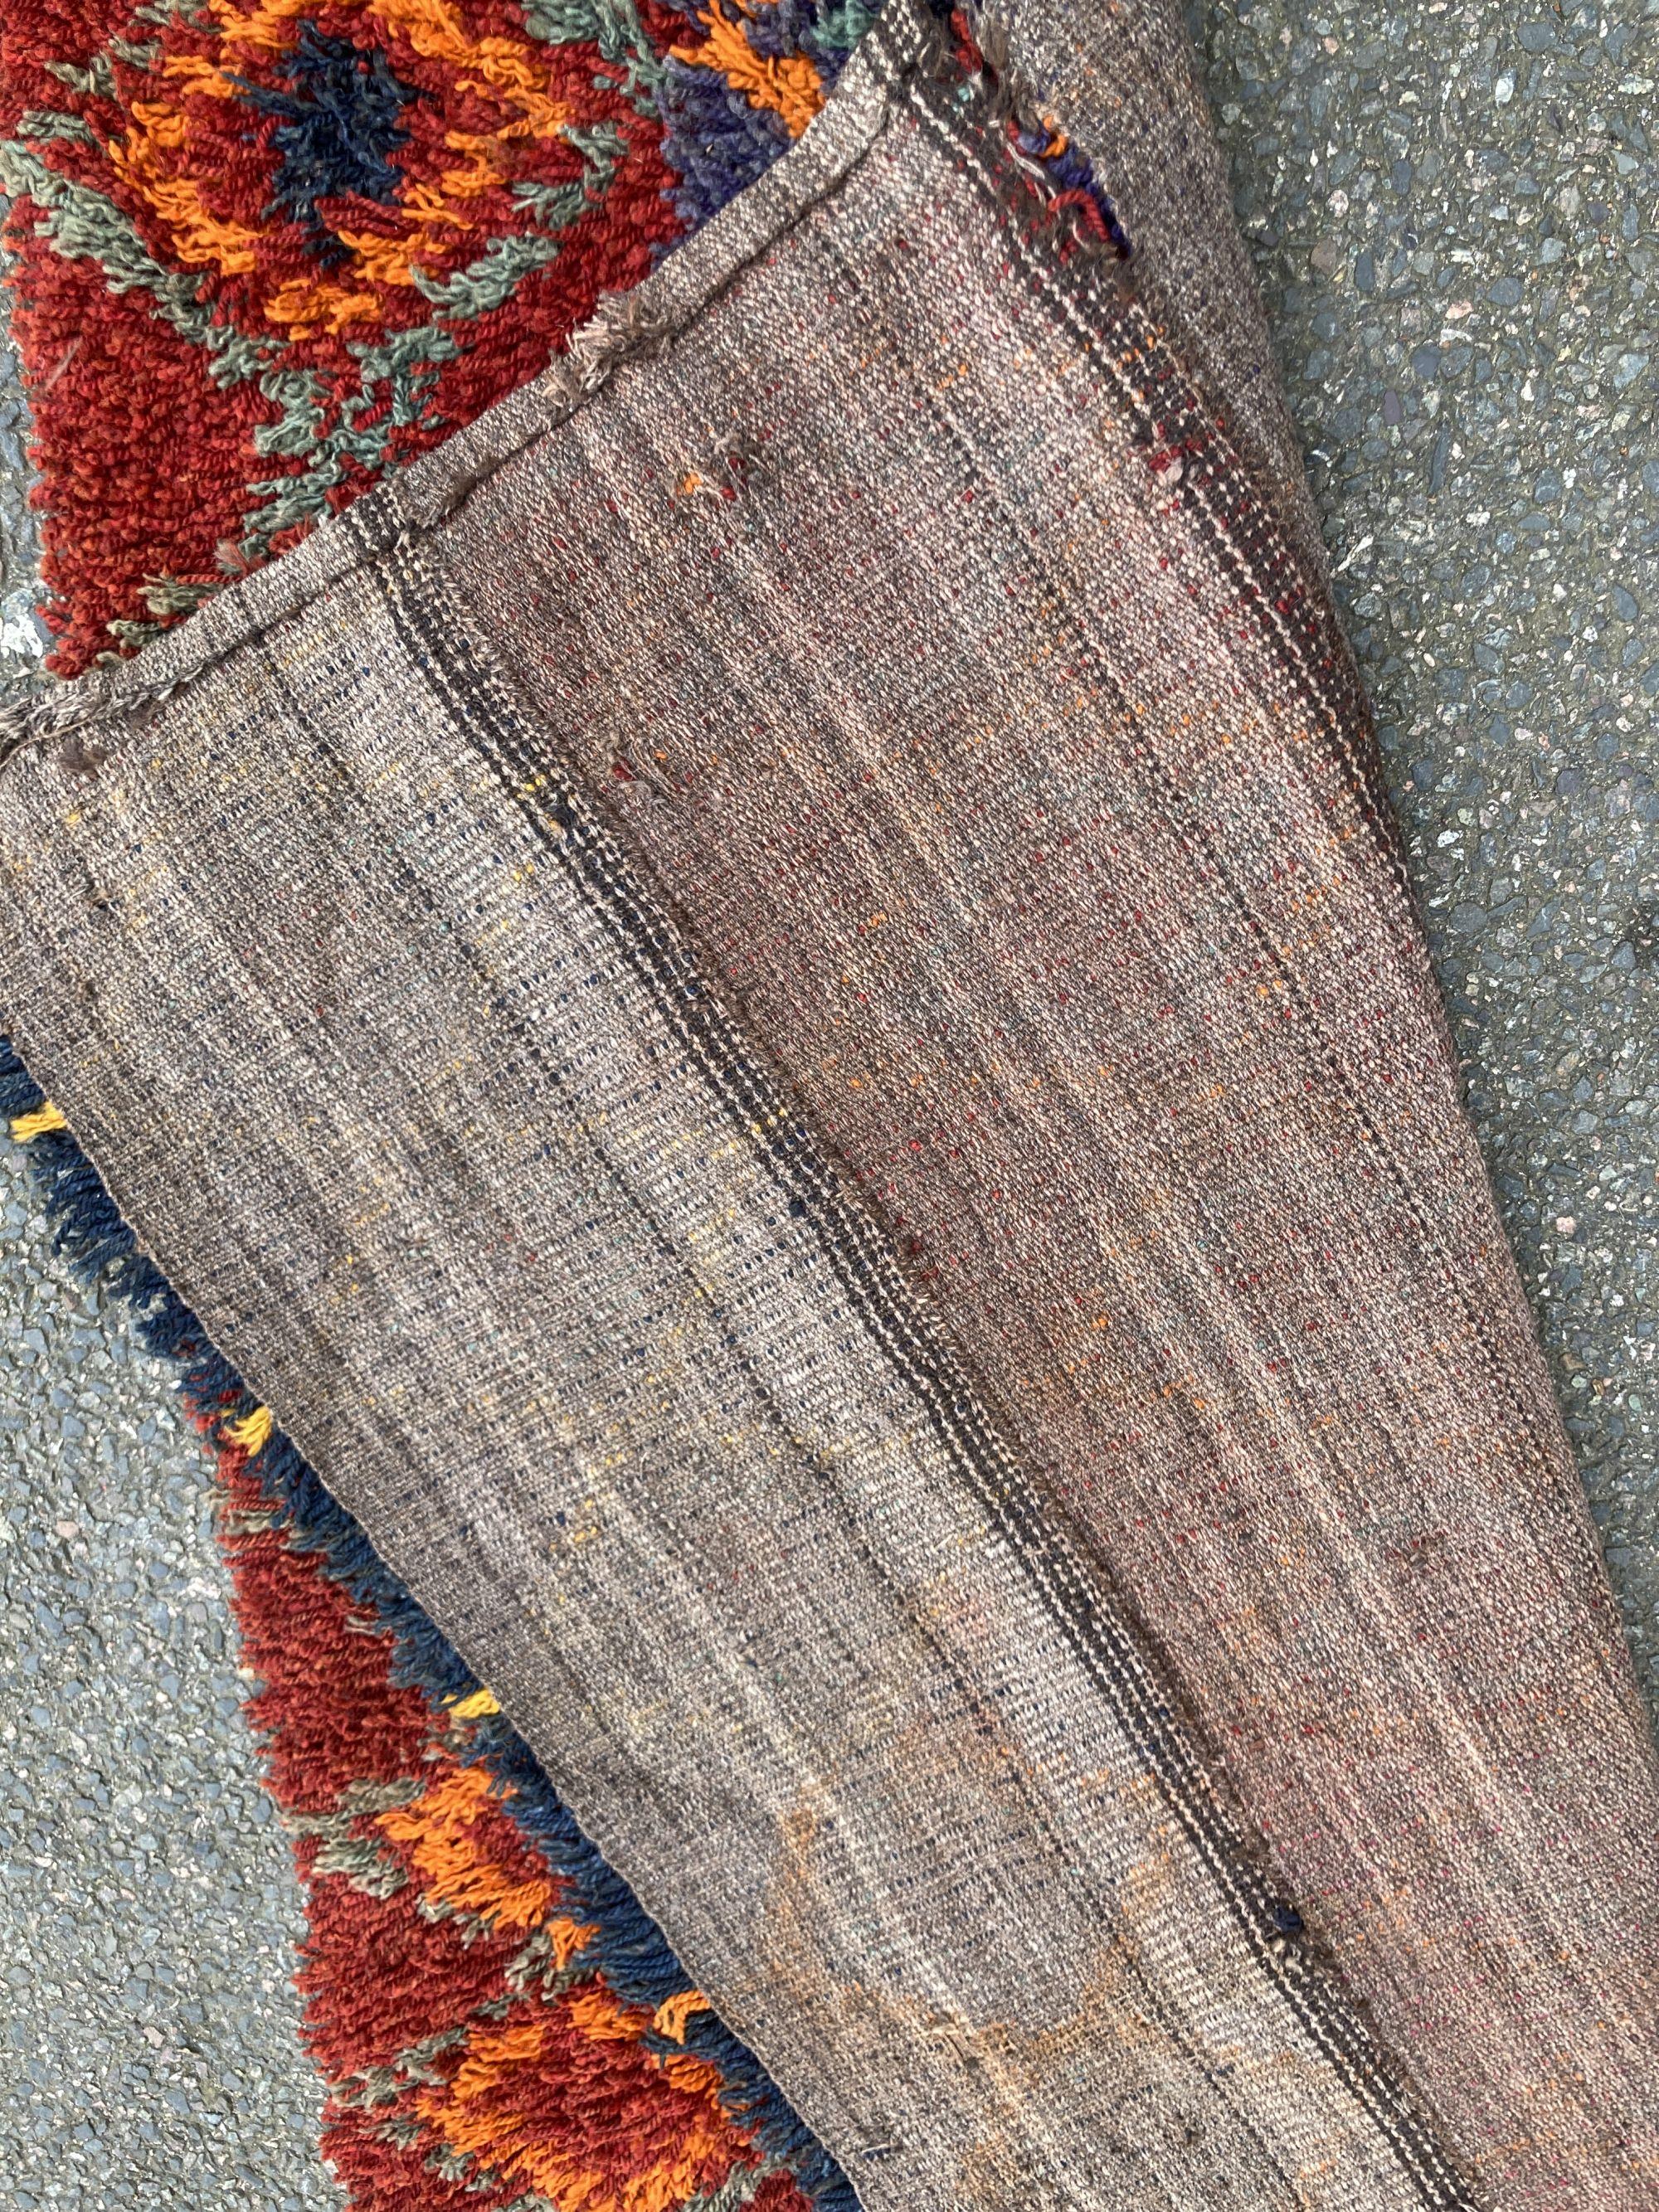 A Turkish wool rug, 187 x 114cm - Image 2 of 2